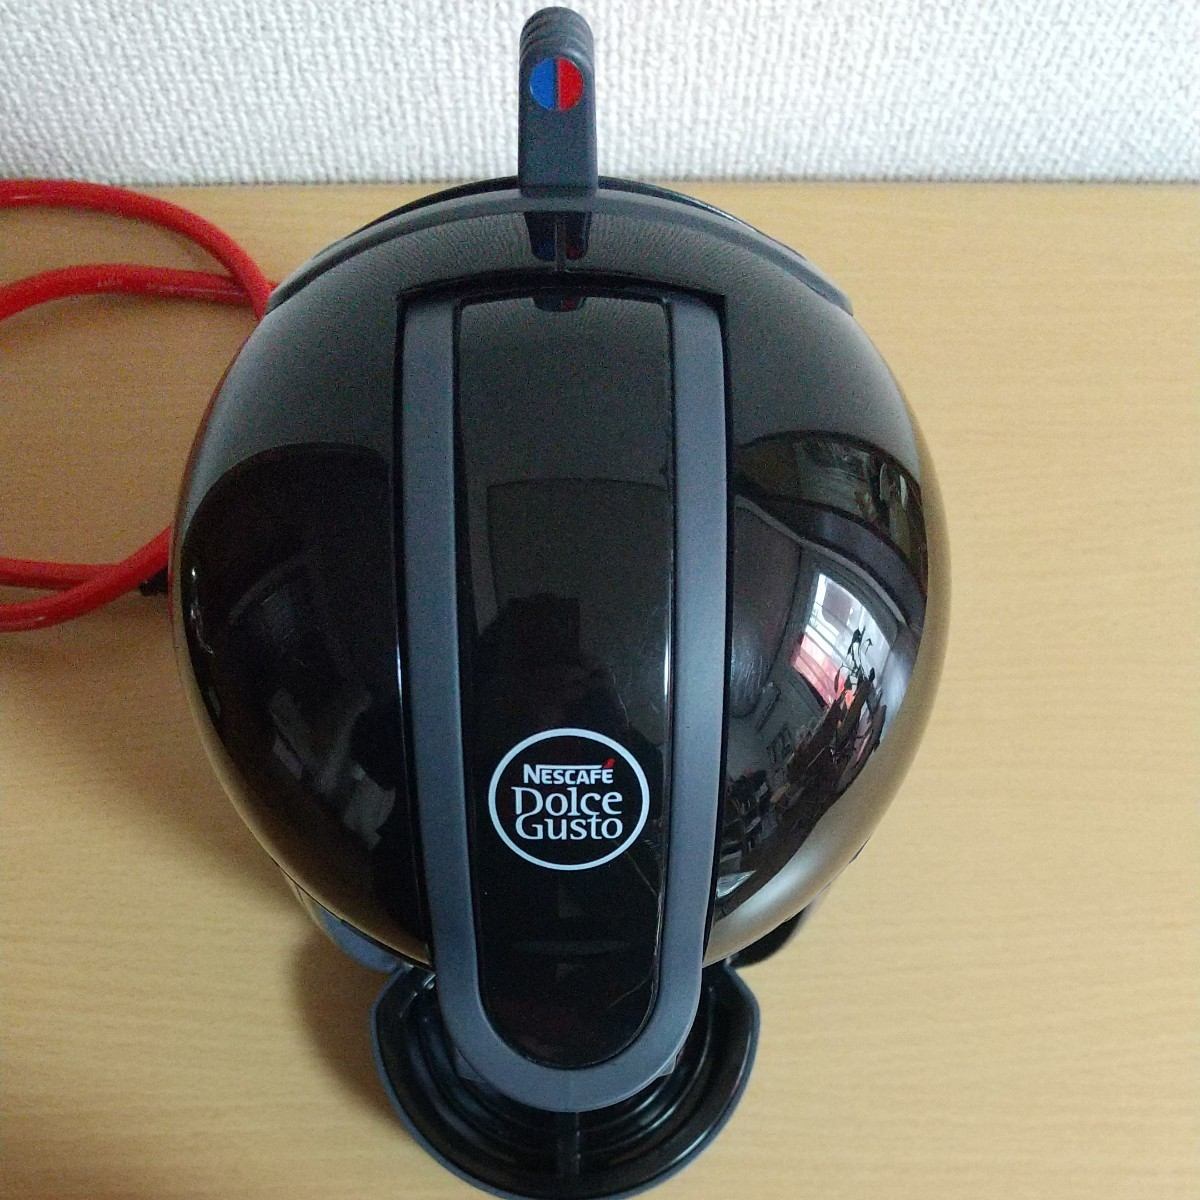 NESCAFE ネスカフェ ドルチェグスト MD9744R ピッコロ(ブラック)